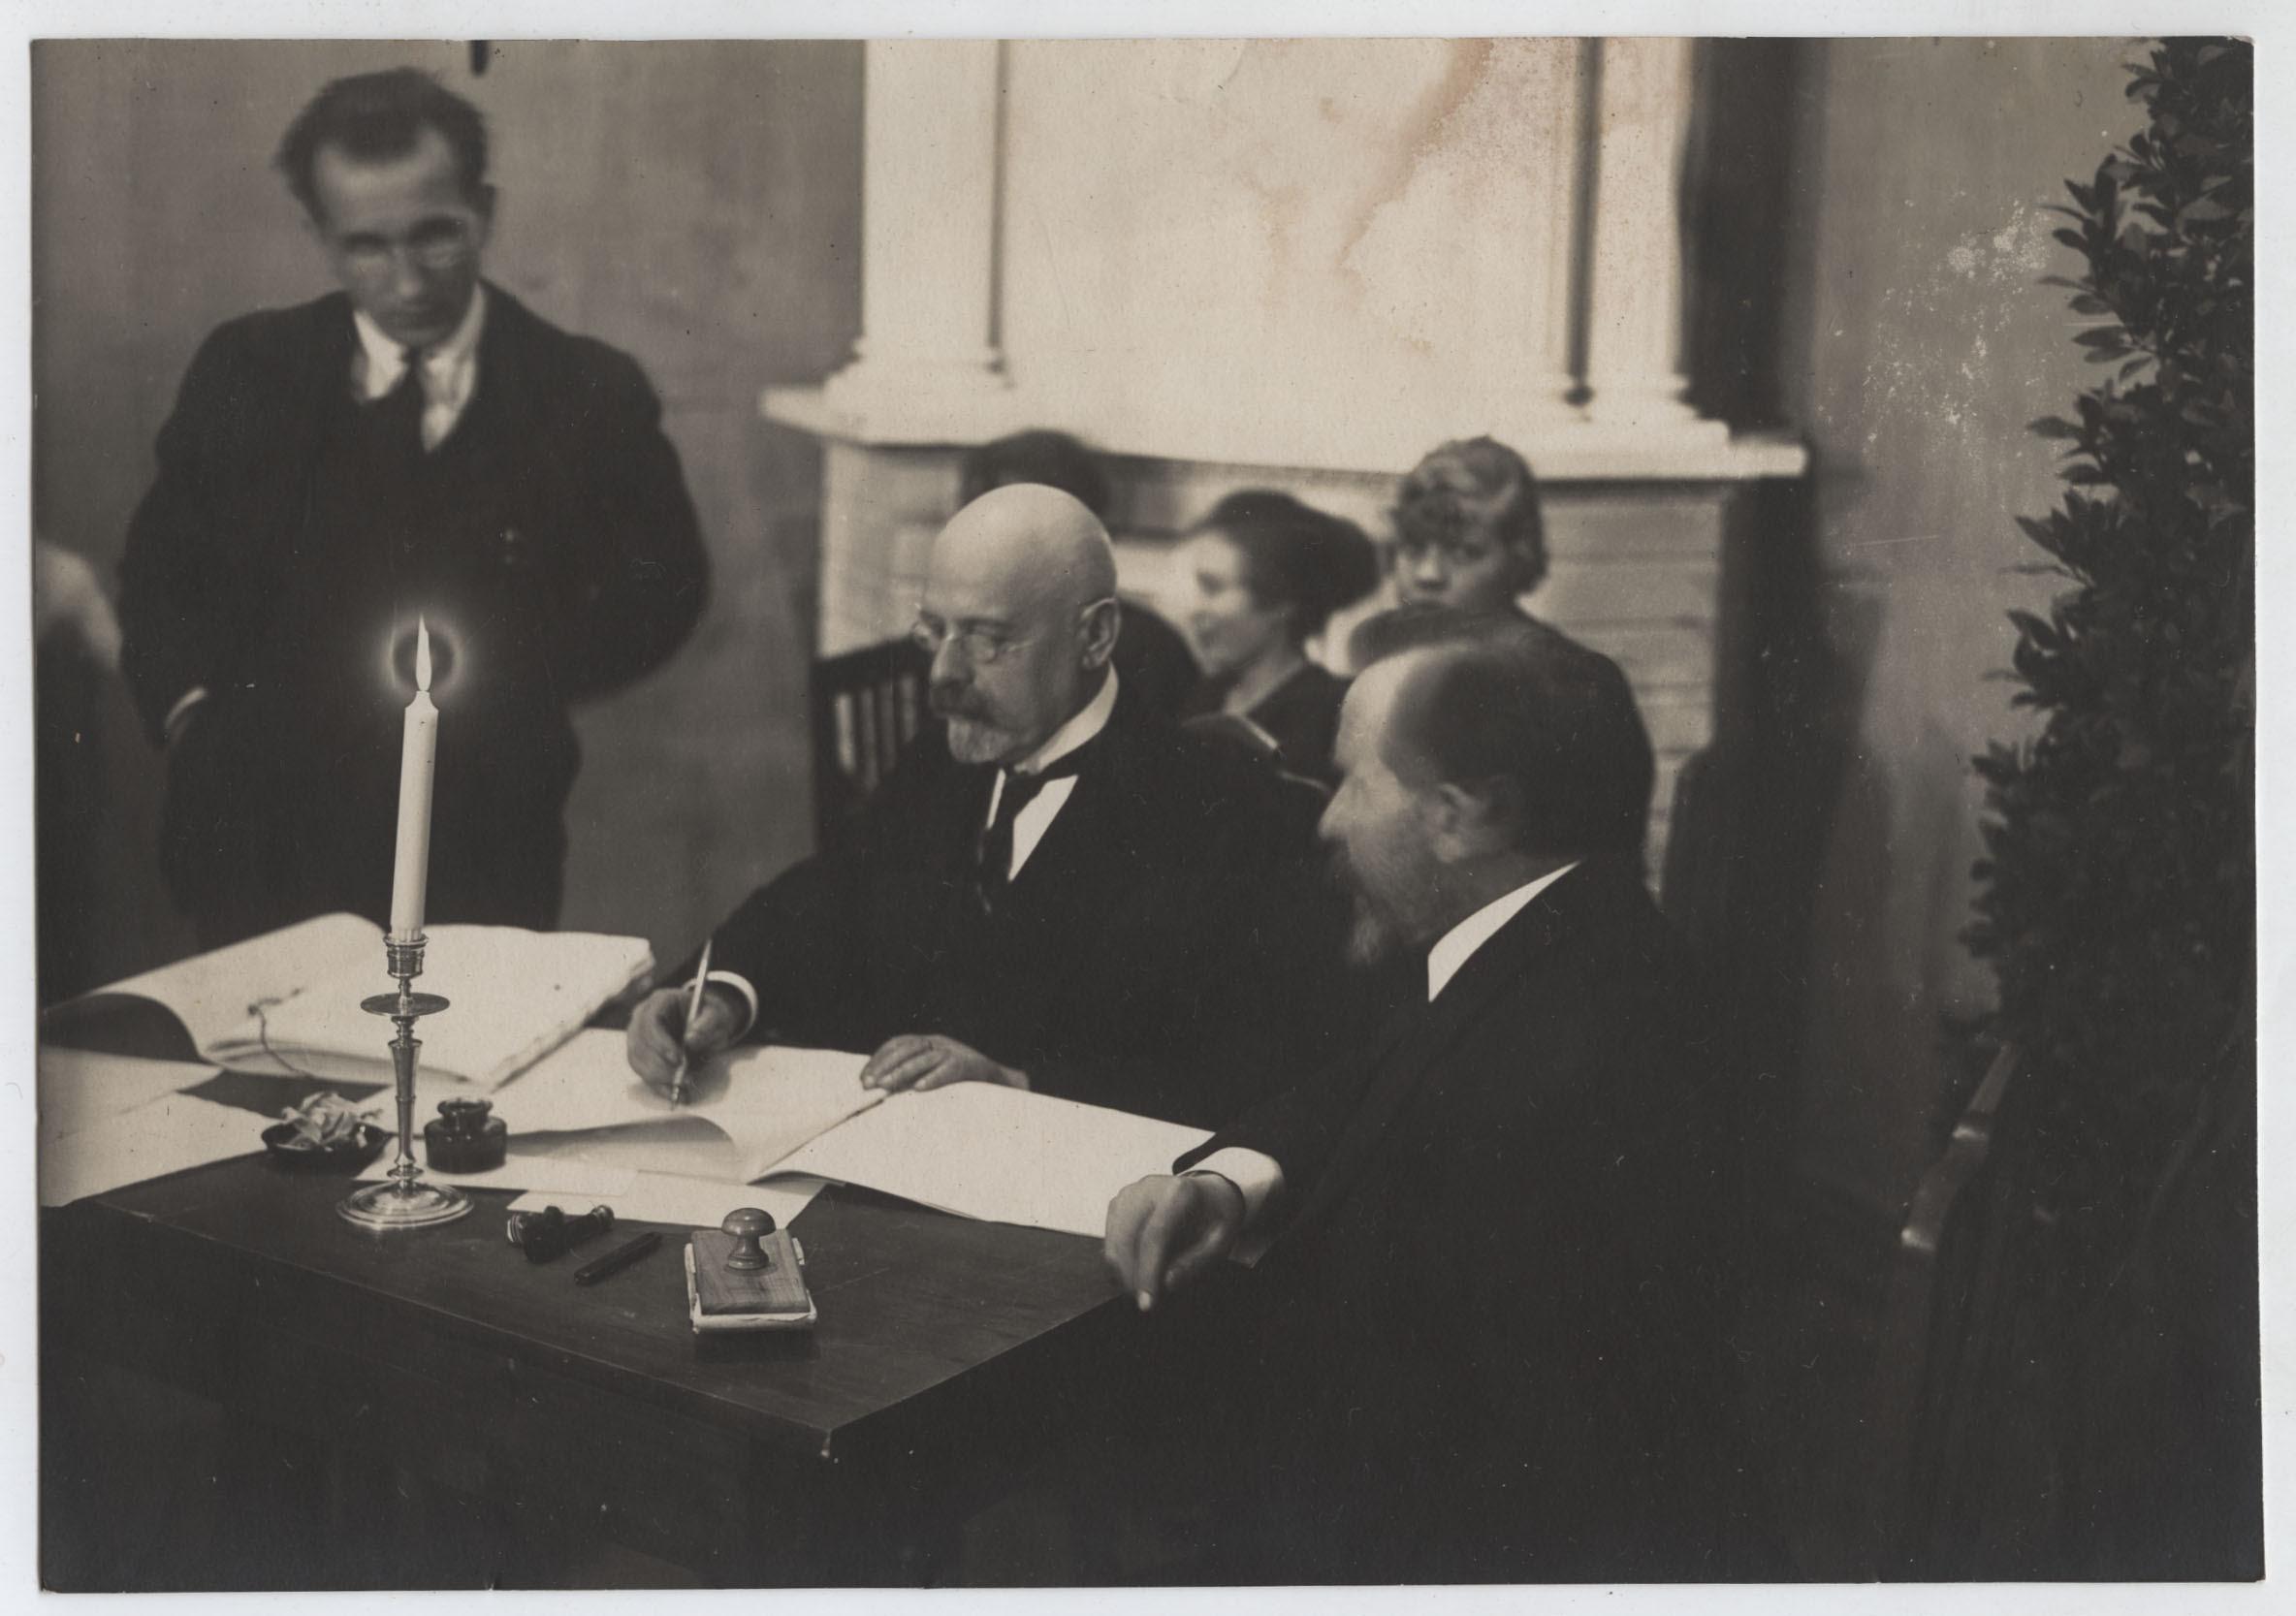 http://upload.wikimedia.org/wikipedia/commons/9/9c/Poska_signing_the_Treaty_of_Tartu.jpg